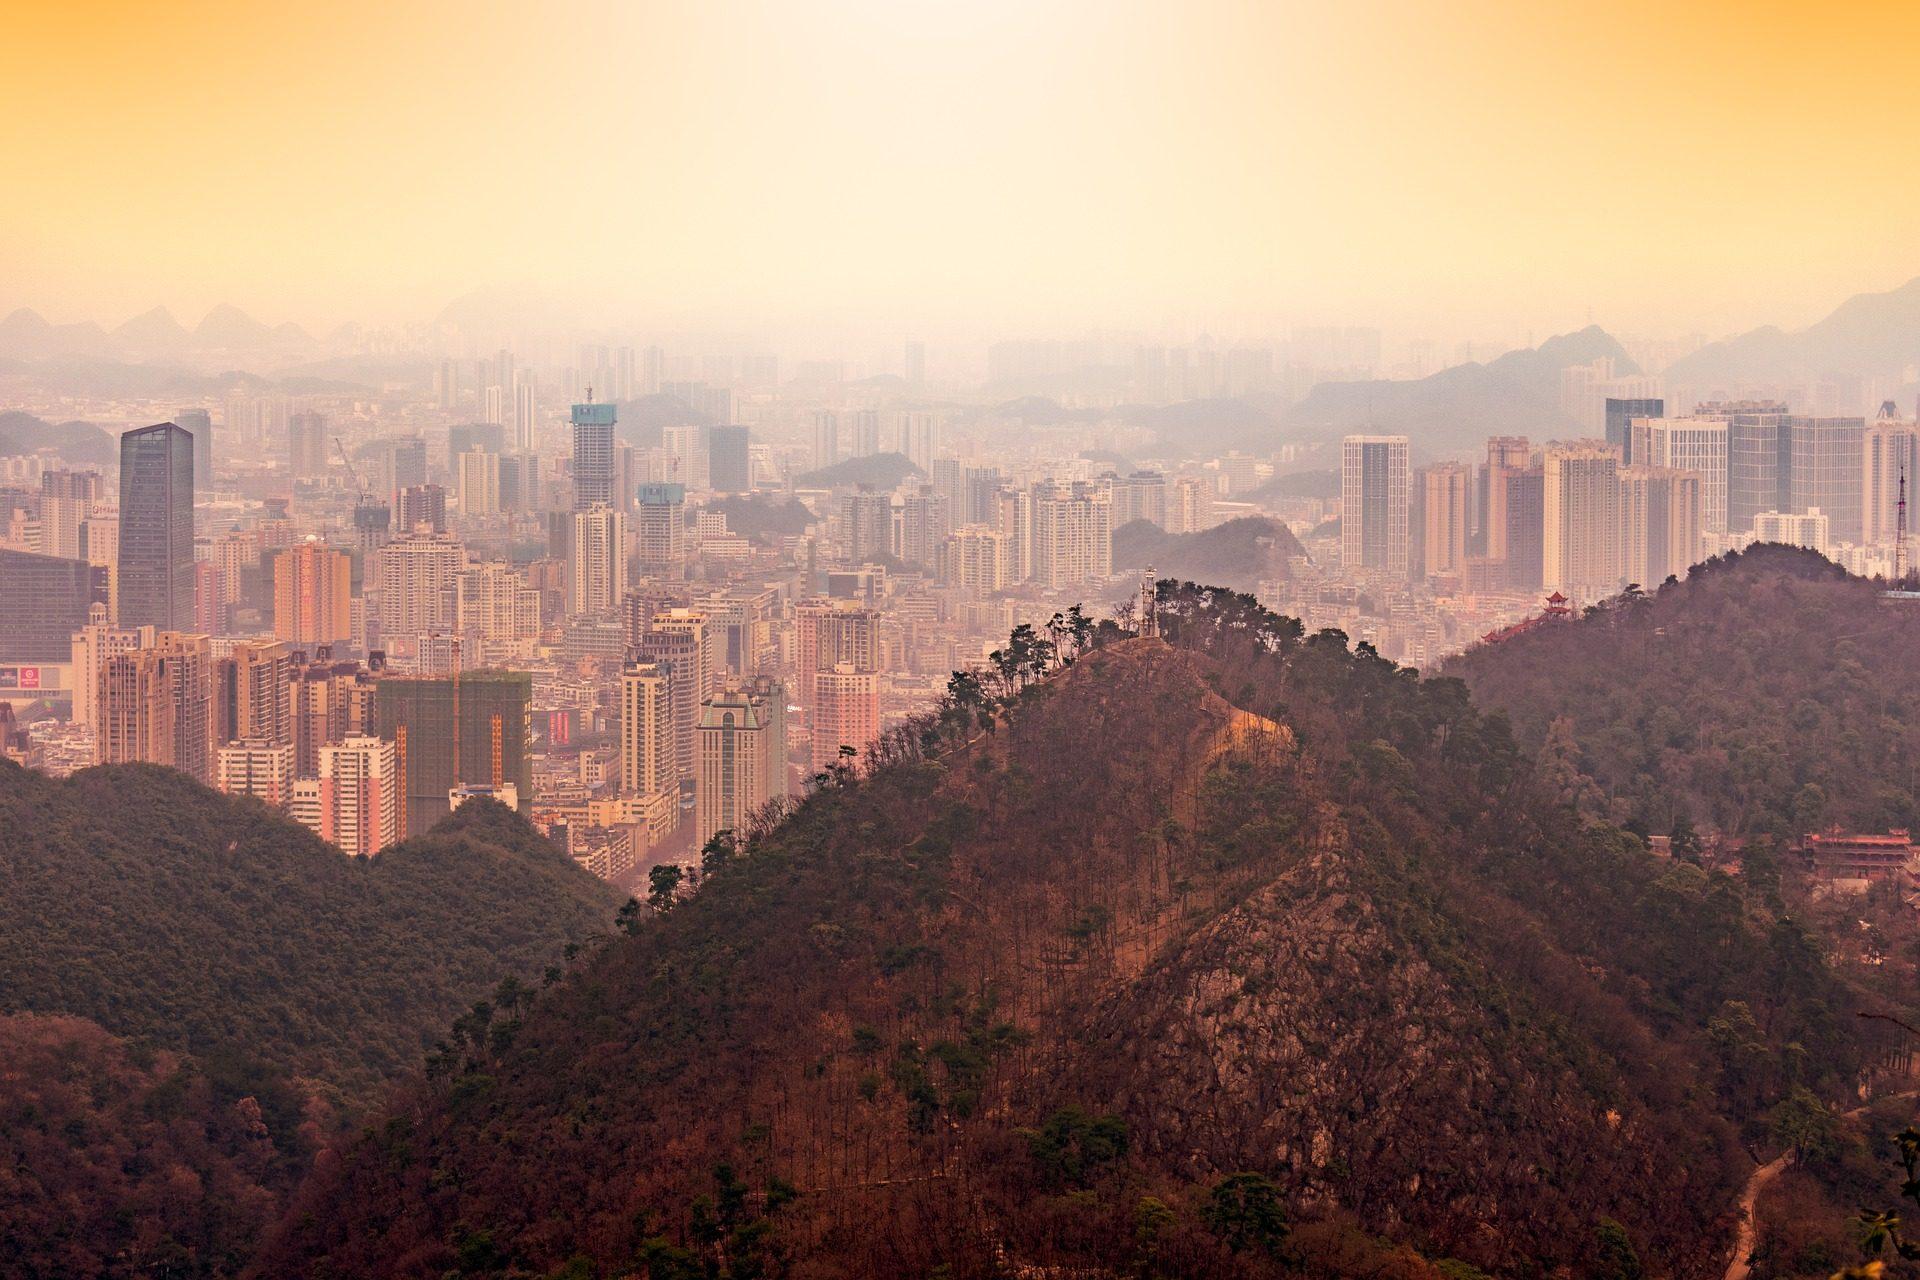 Ville, bâtiments, gratte-ciel, Montañas, arbres, Guiyang - Fonds d'écran HD - Professor-falken.com